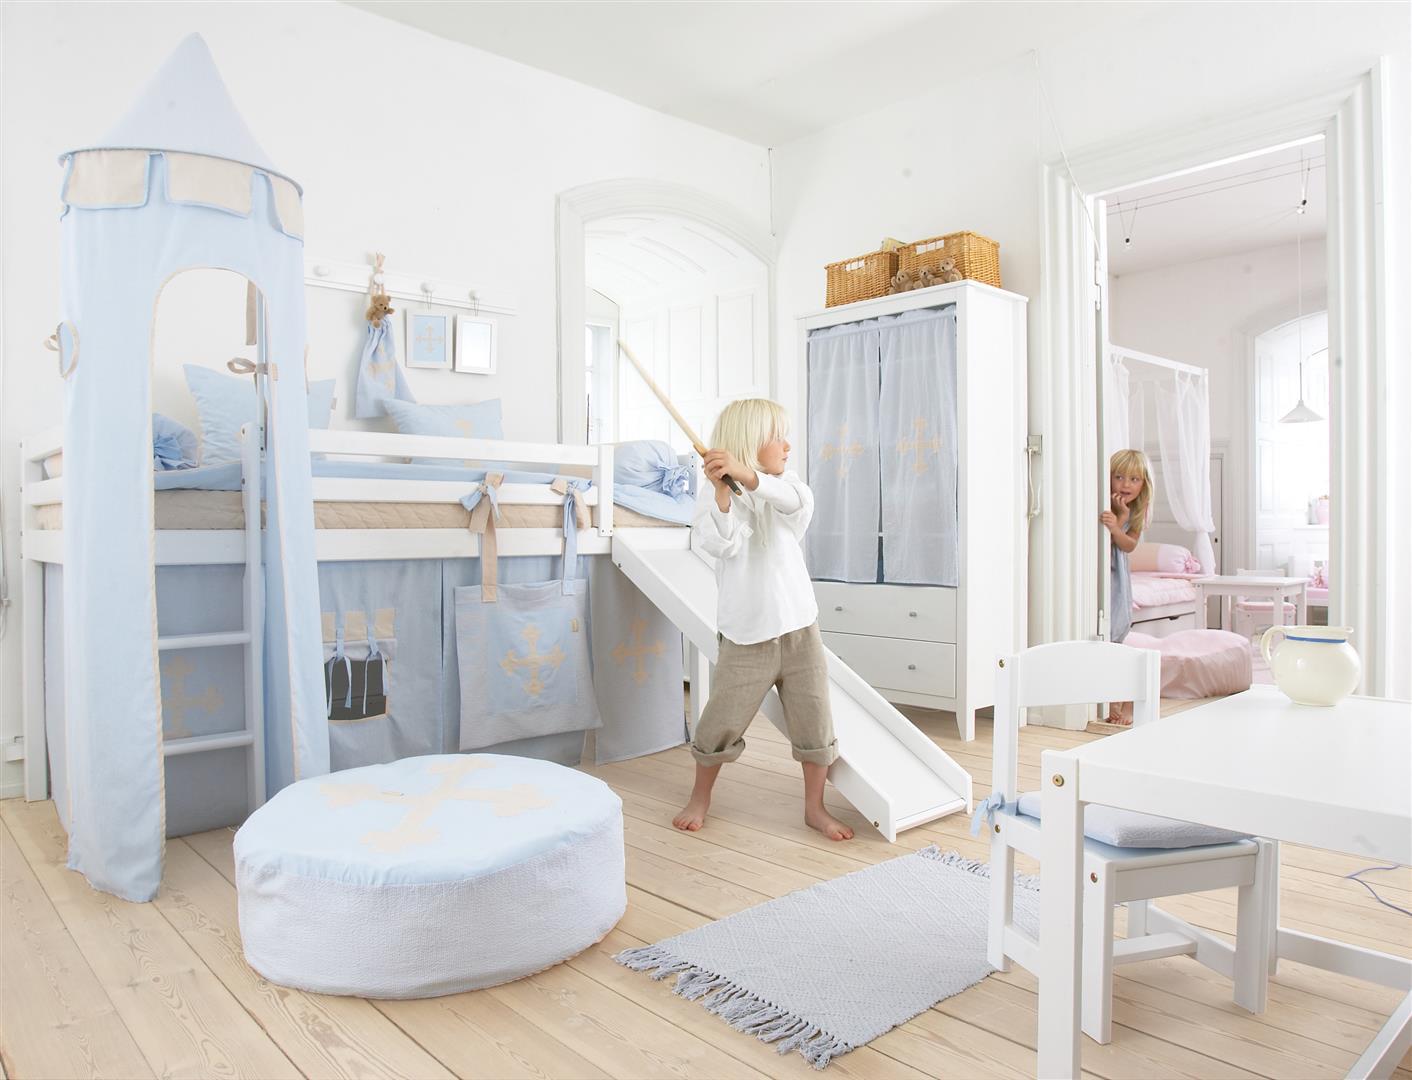 id e d co chambre enfant un sol pratique fun et original. Black Bedroom Furniture Sets. Home Design Ideas